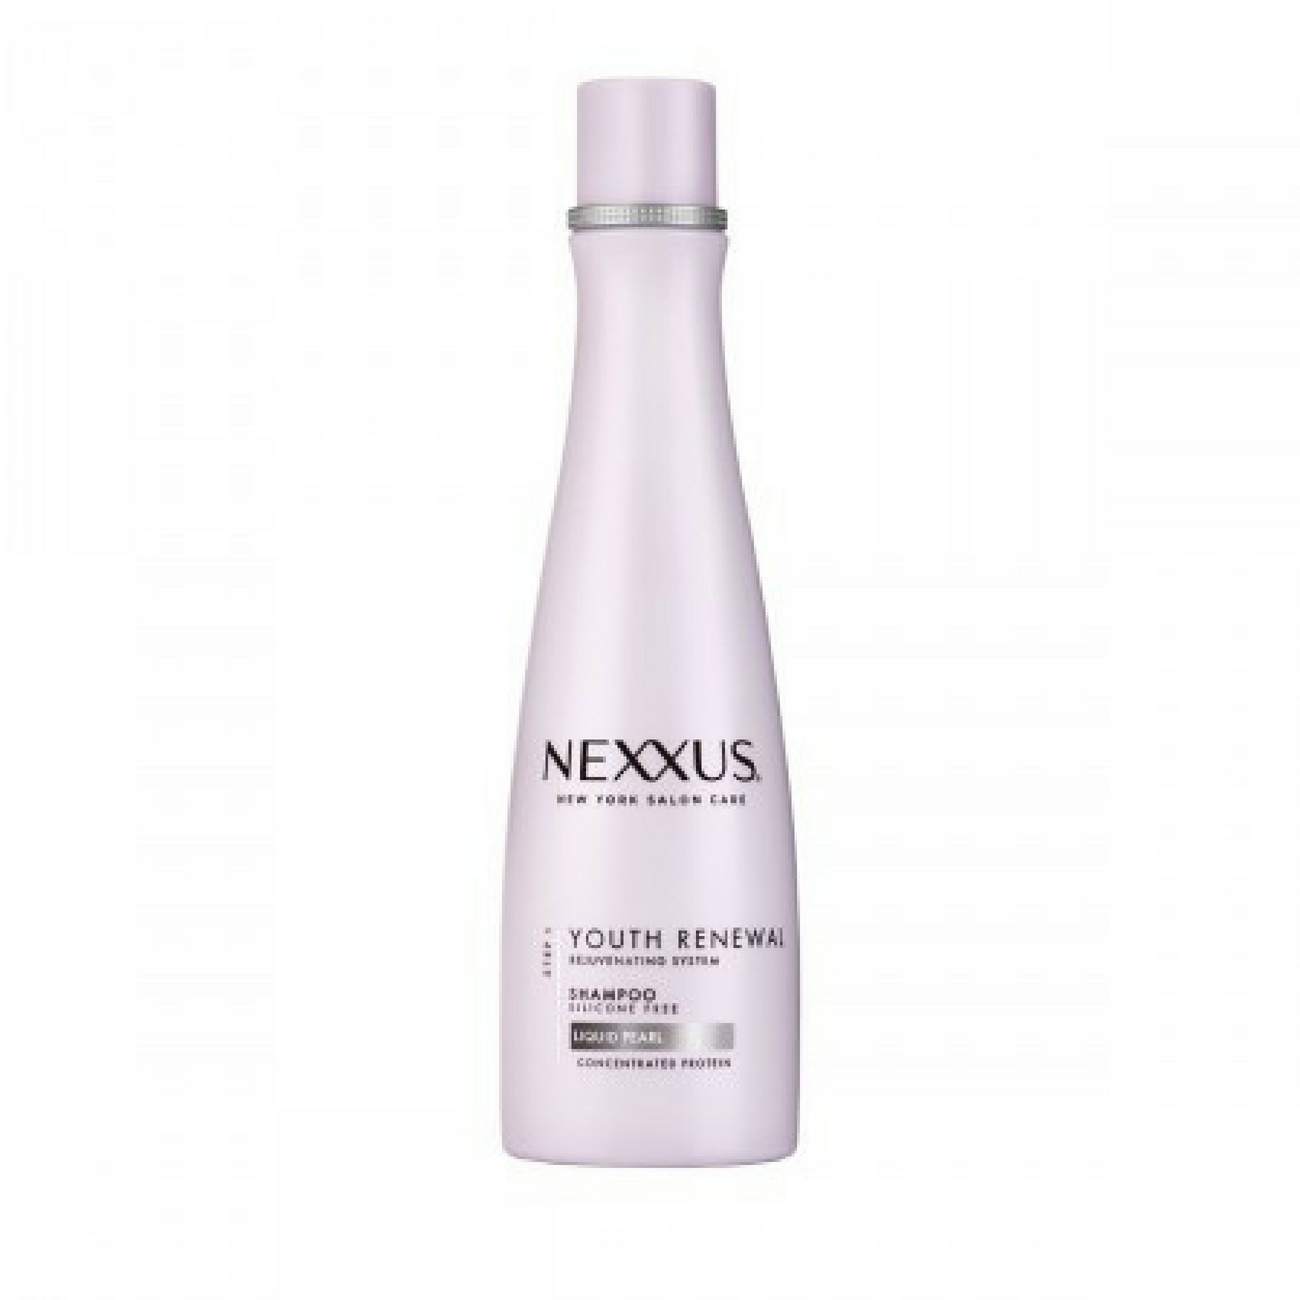 Shampoo Nexxus Youth Renewal 250ml